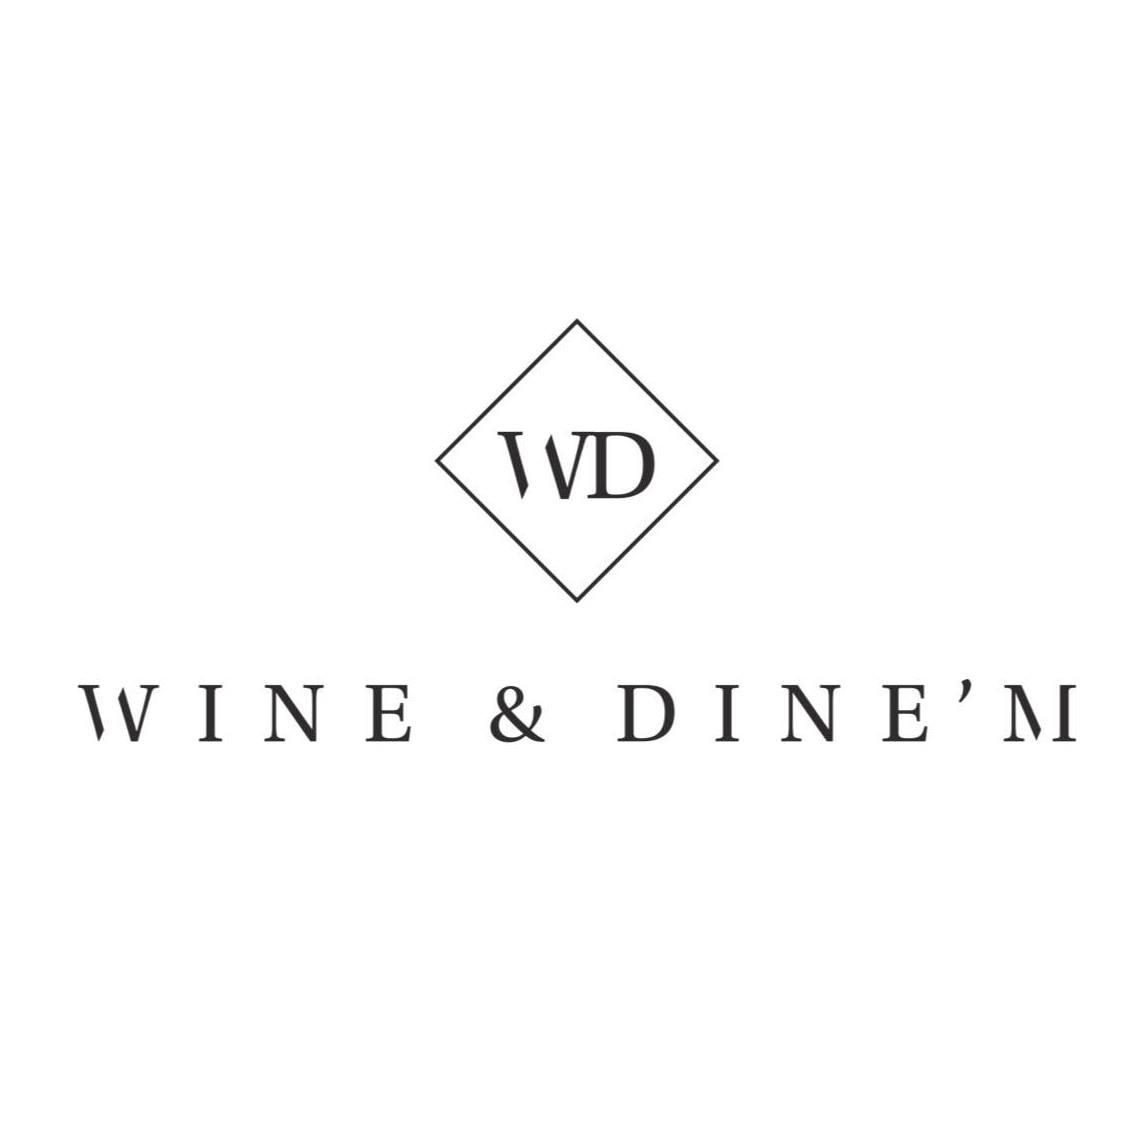 Wine-n-Dine-m-Logo.jpg